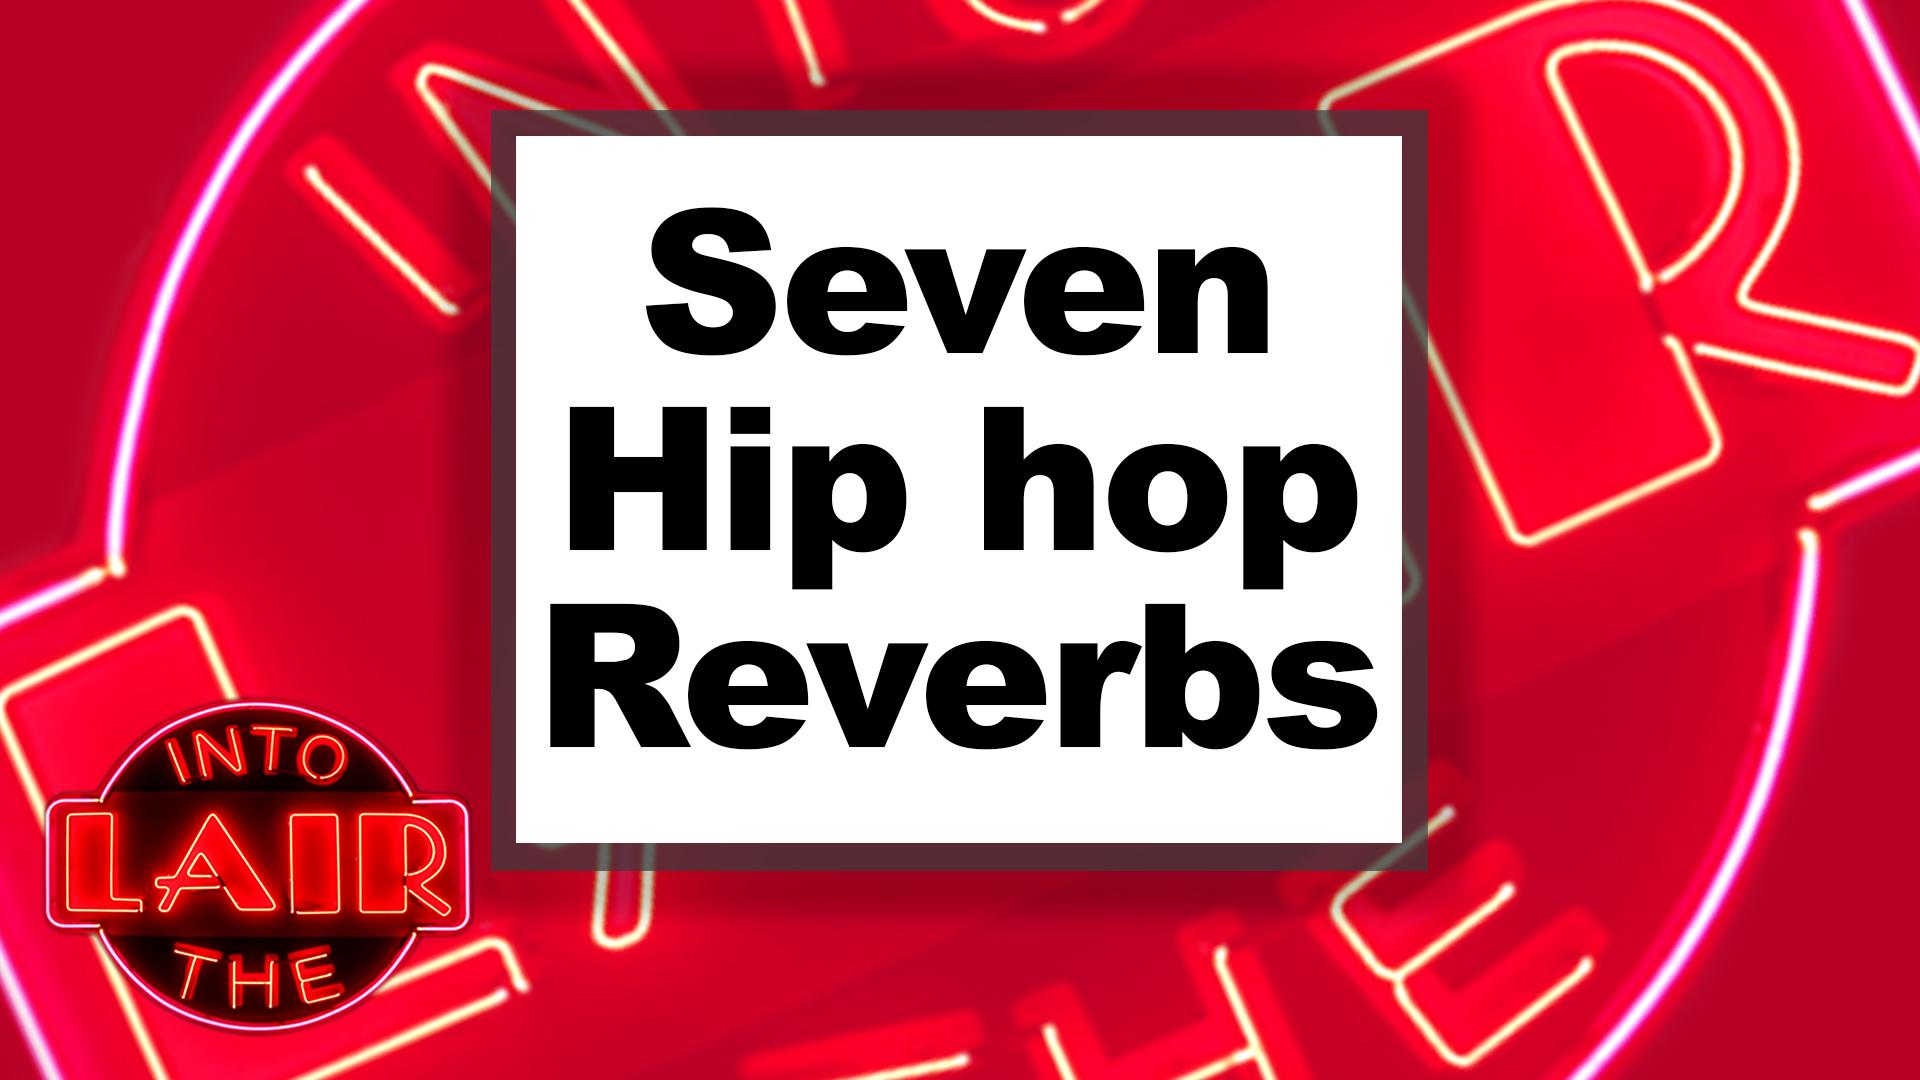 Seven Hip-Hop Reverbs